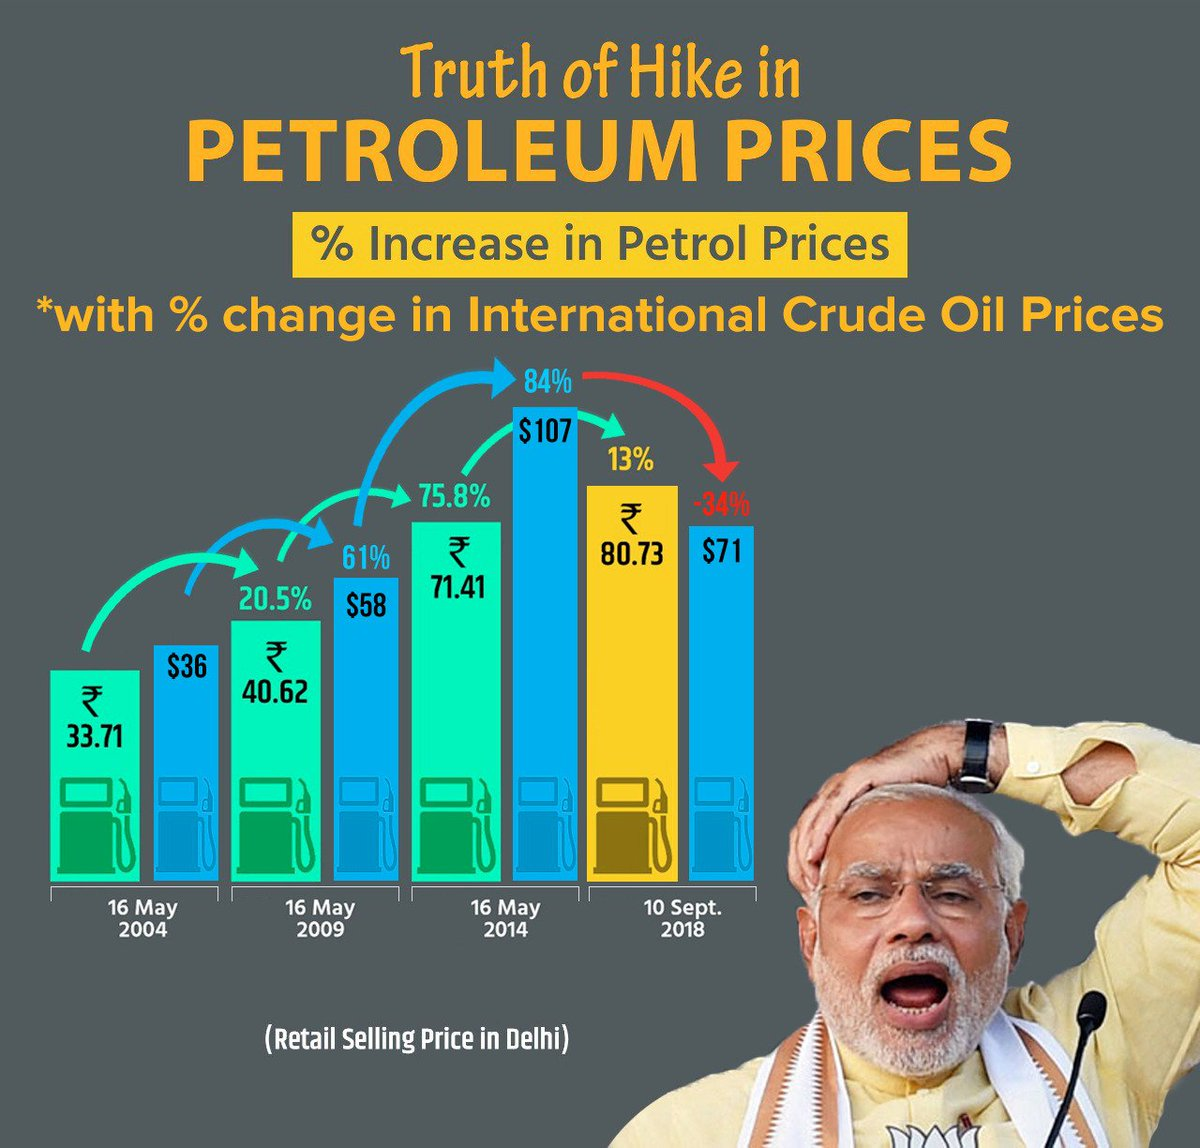 There! Fixed it for you @BJP4India #MehangiPadiModiSarkar